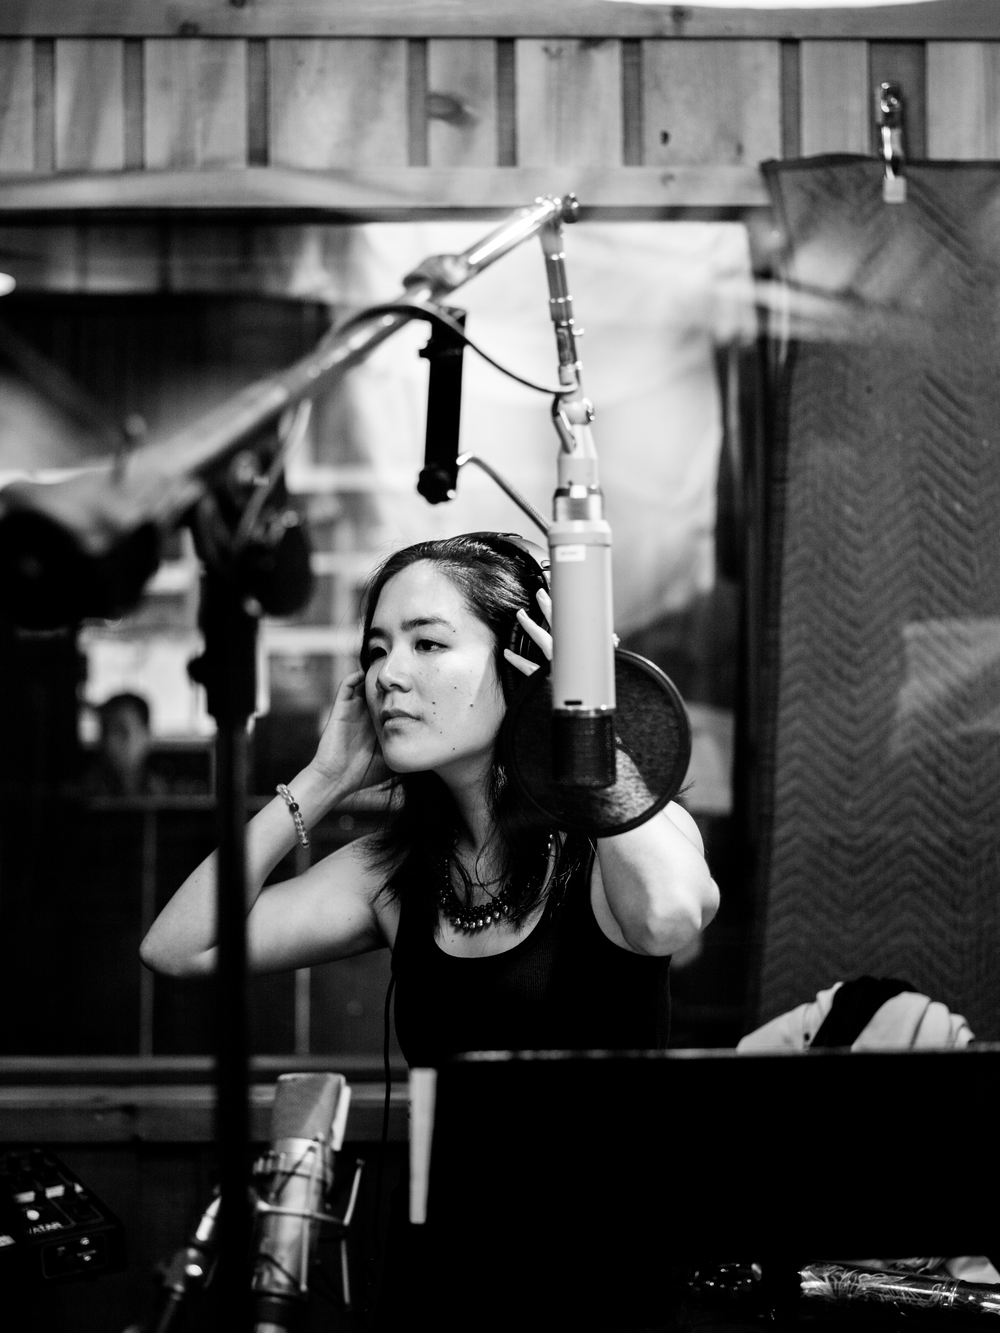 Avatar Studios NYC 2013